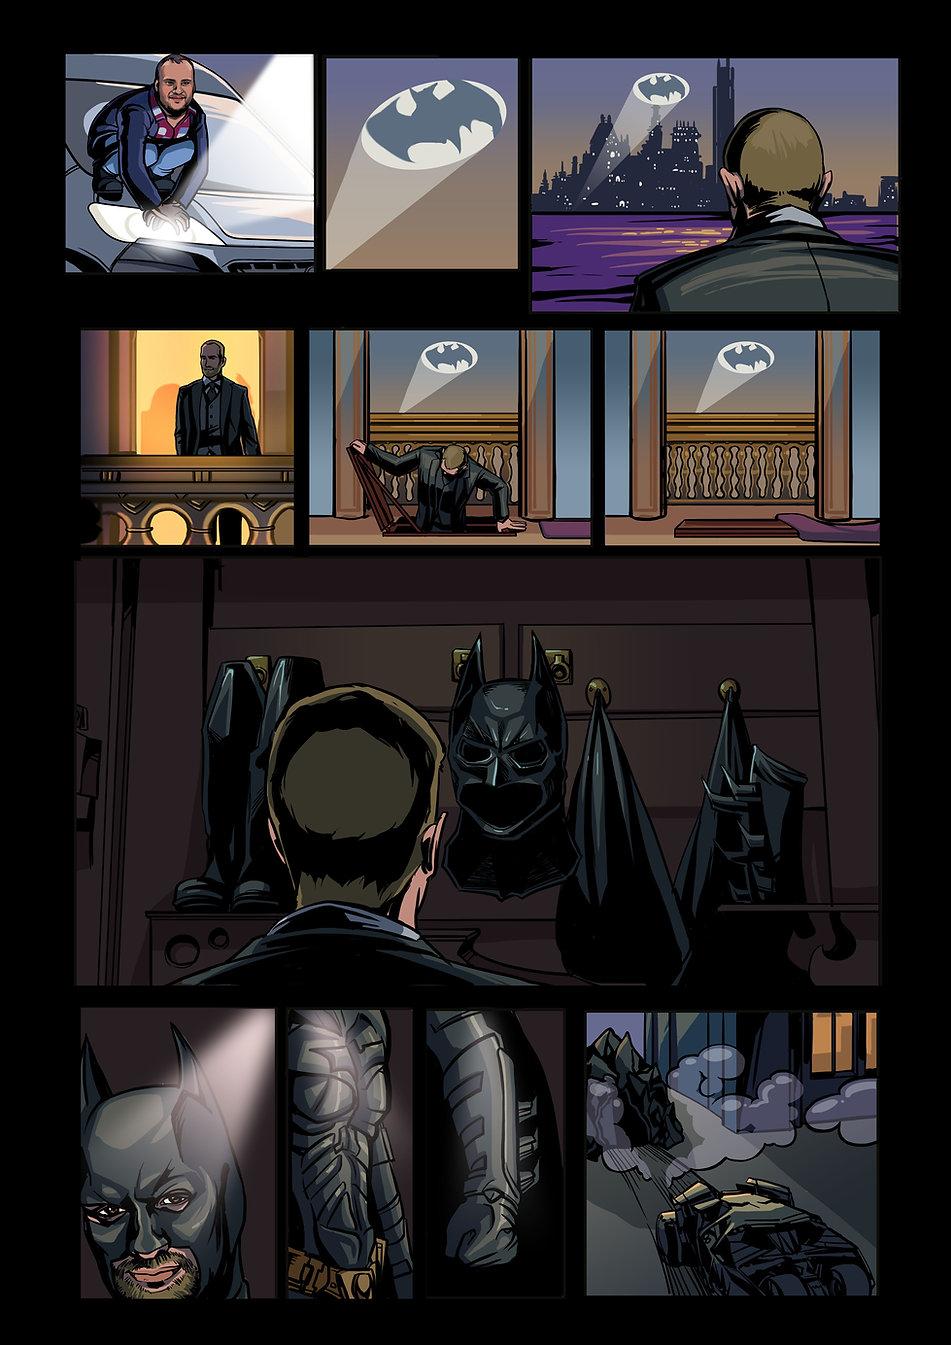 Авторский комикс другу на заказ. Бэтмен. Страница 4